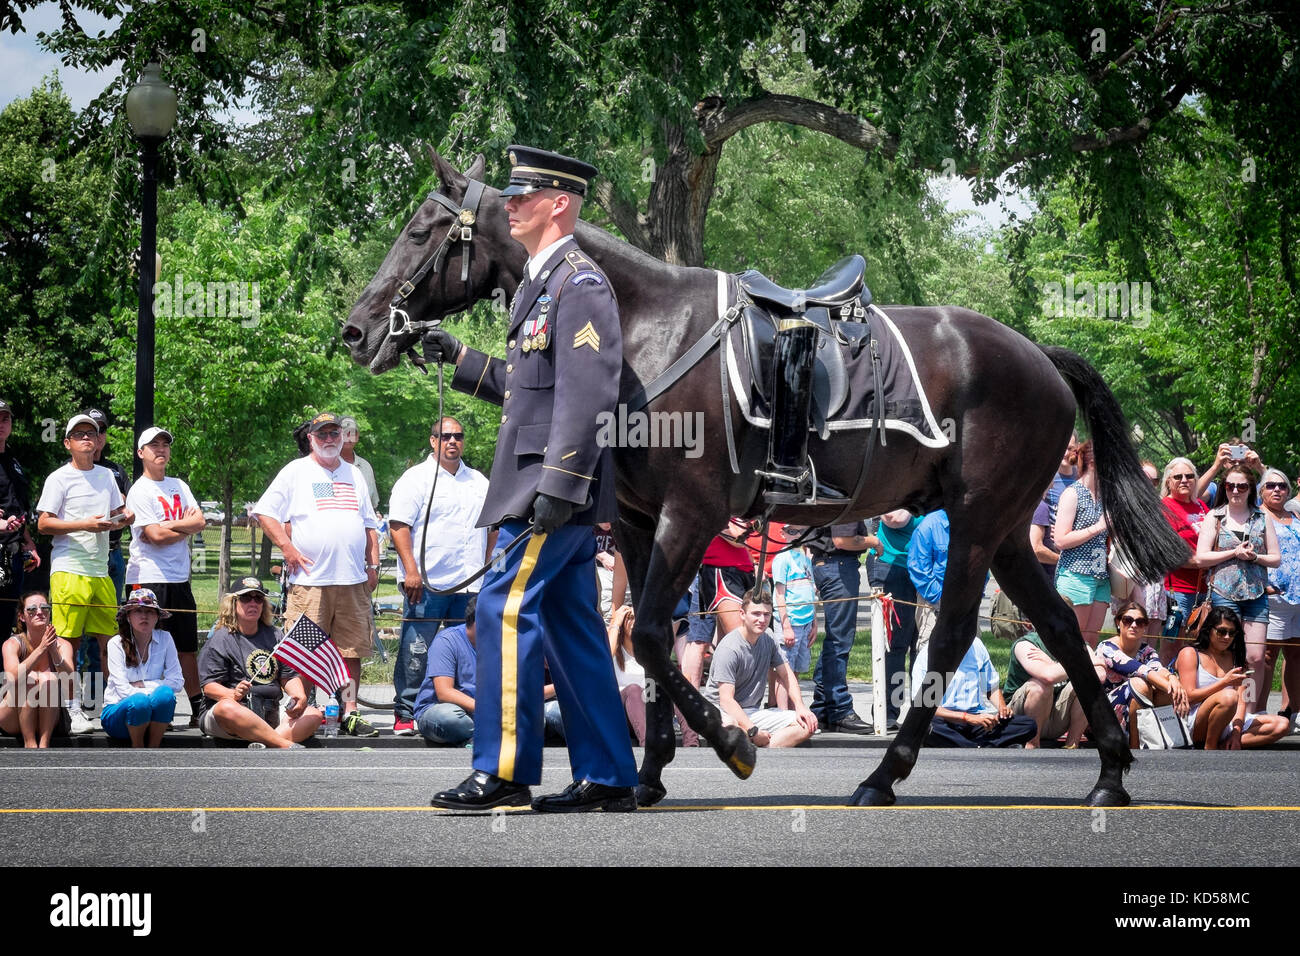 Washington Dc May 25 2015 Memorial Day Parade Led By A Riderless Stock Photo Alamy